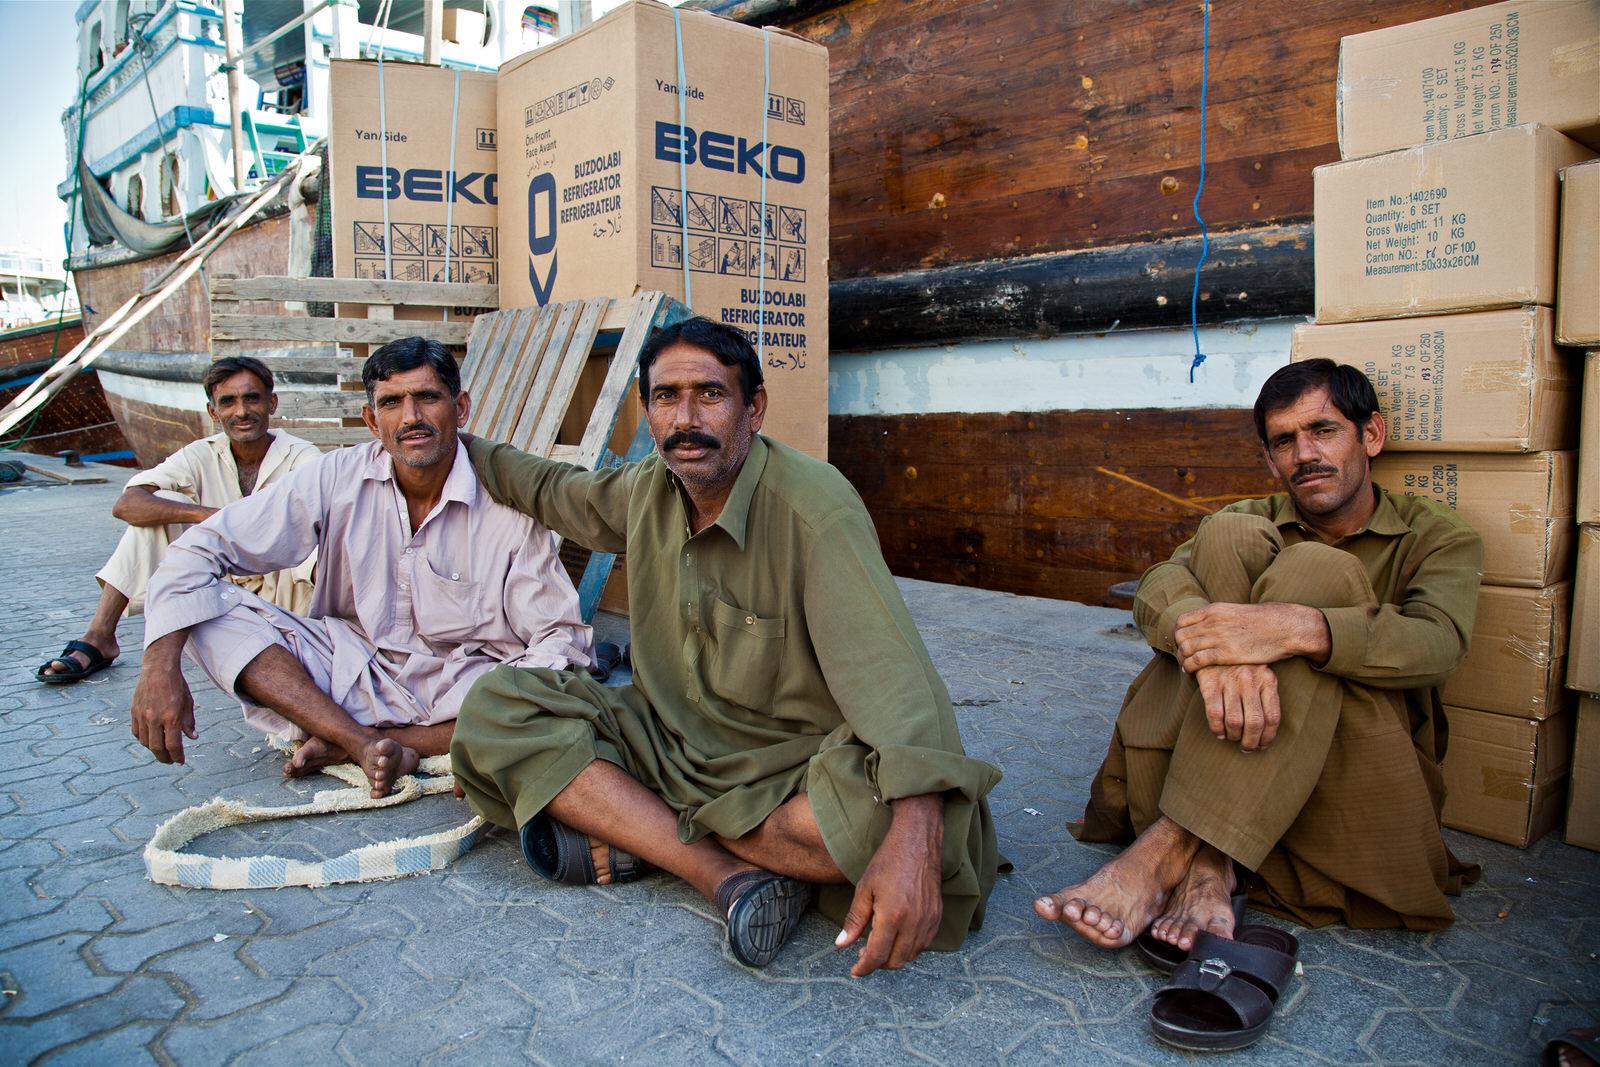 Merchants on the dhow wharf